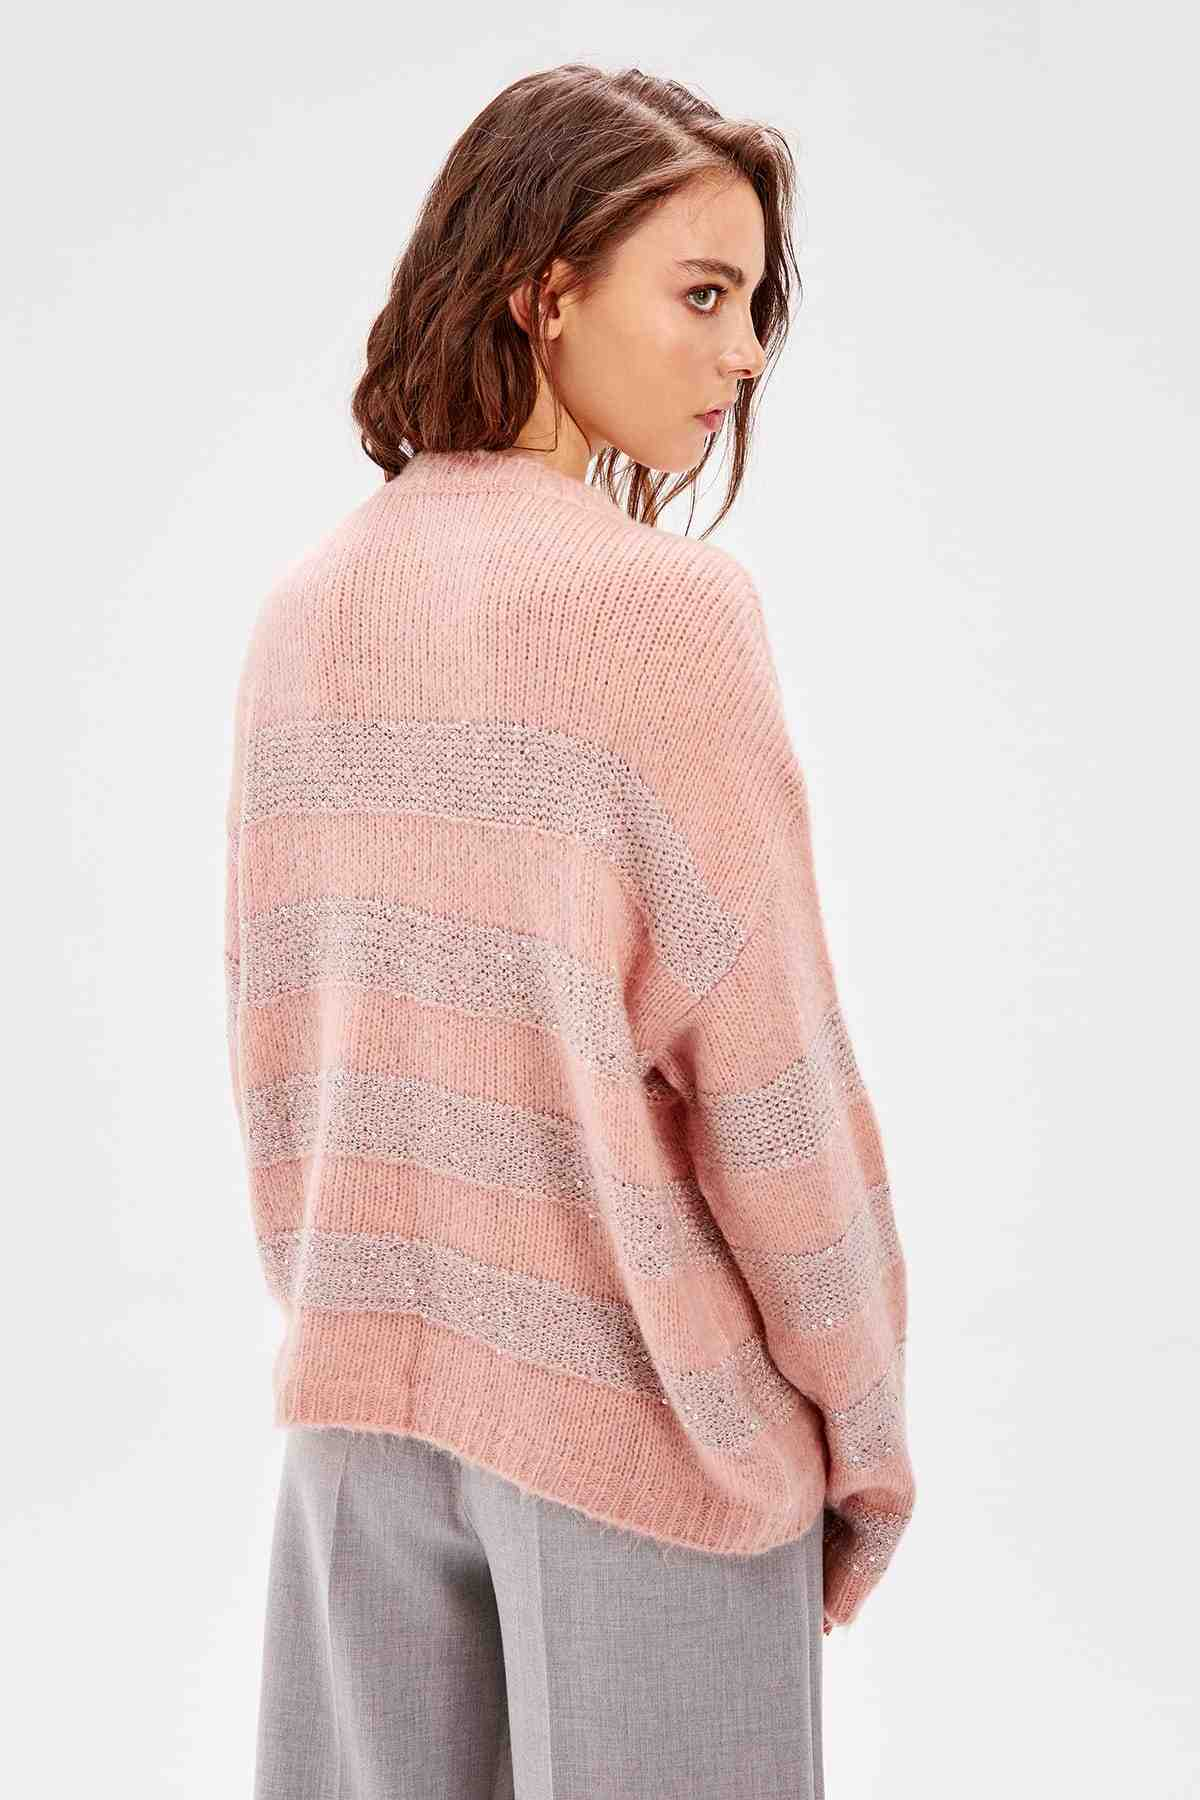 Trendyol WOMEN-Pink Sequin and Sim 상세 니트웨어 스웨터 TWOAW20NV0033